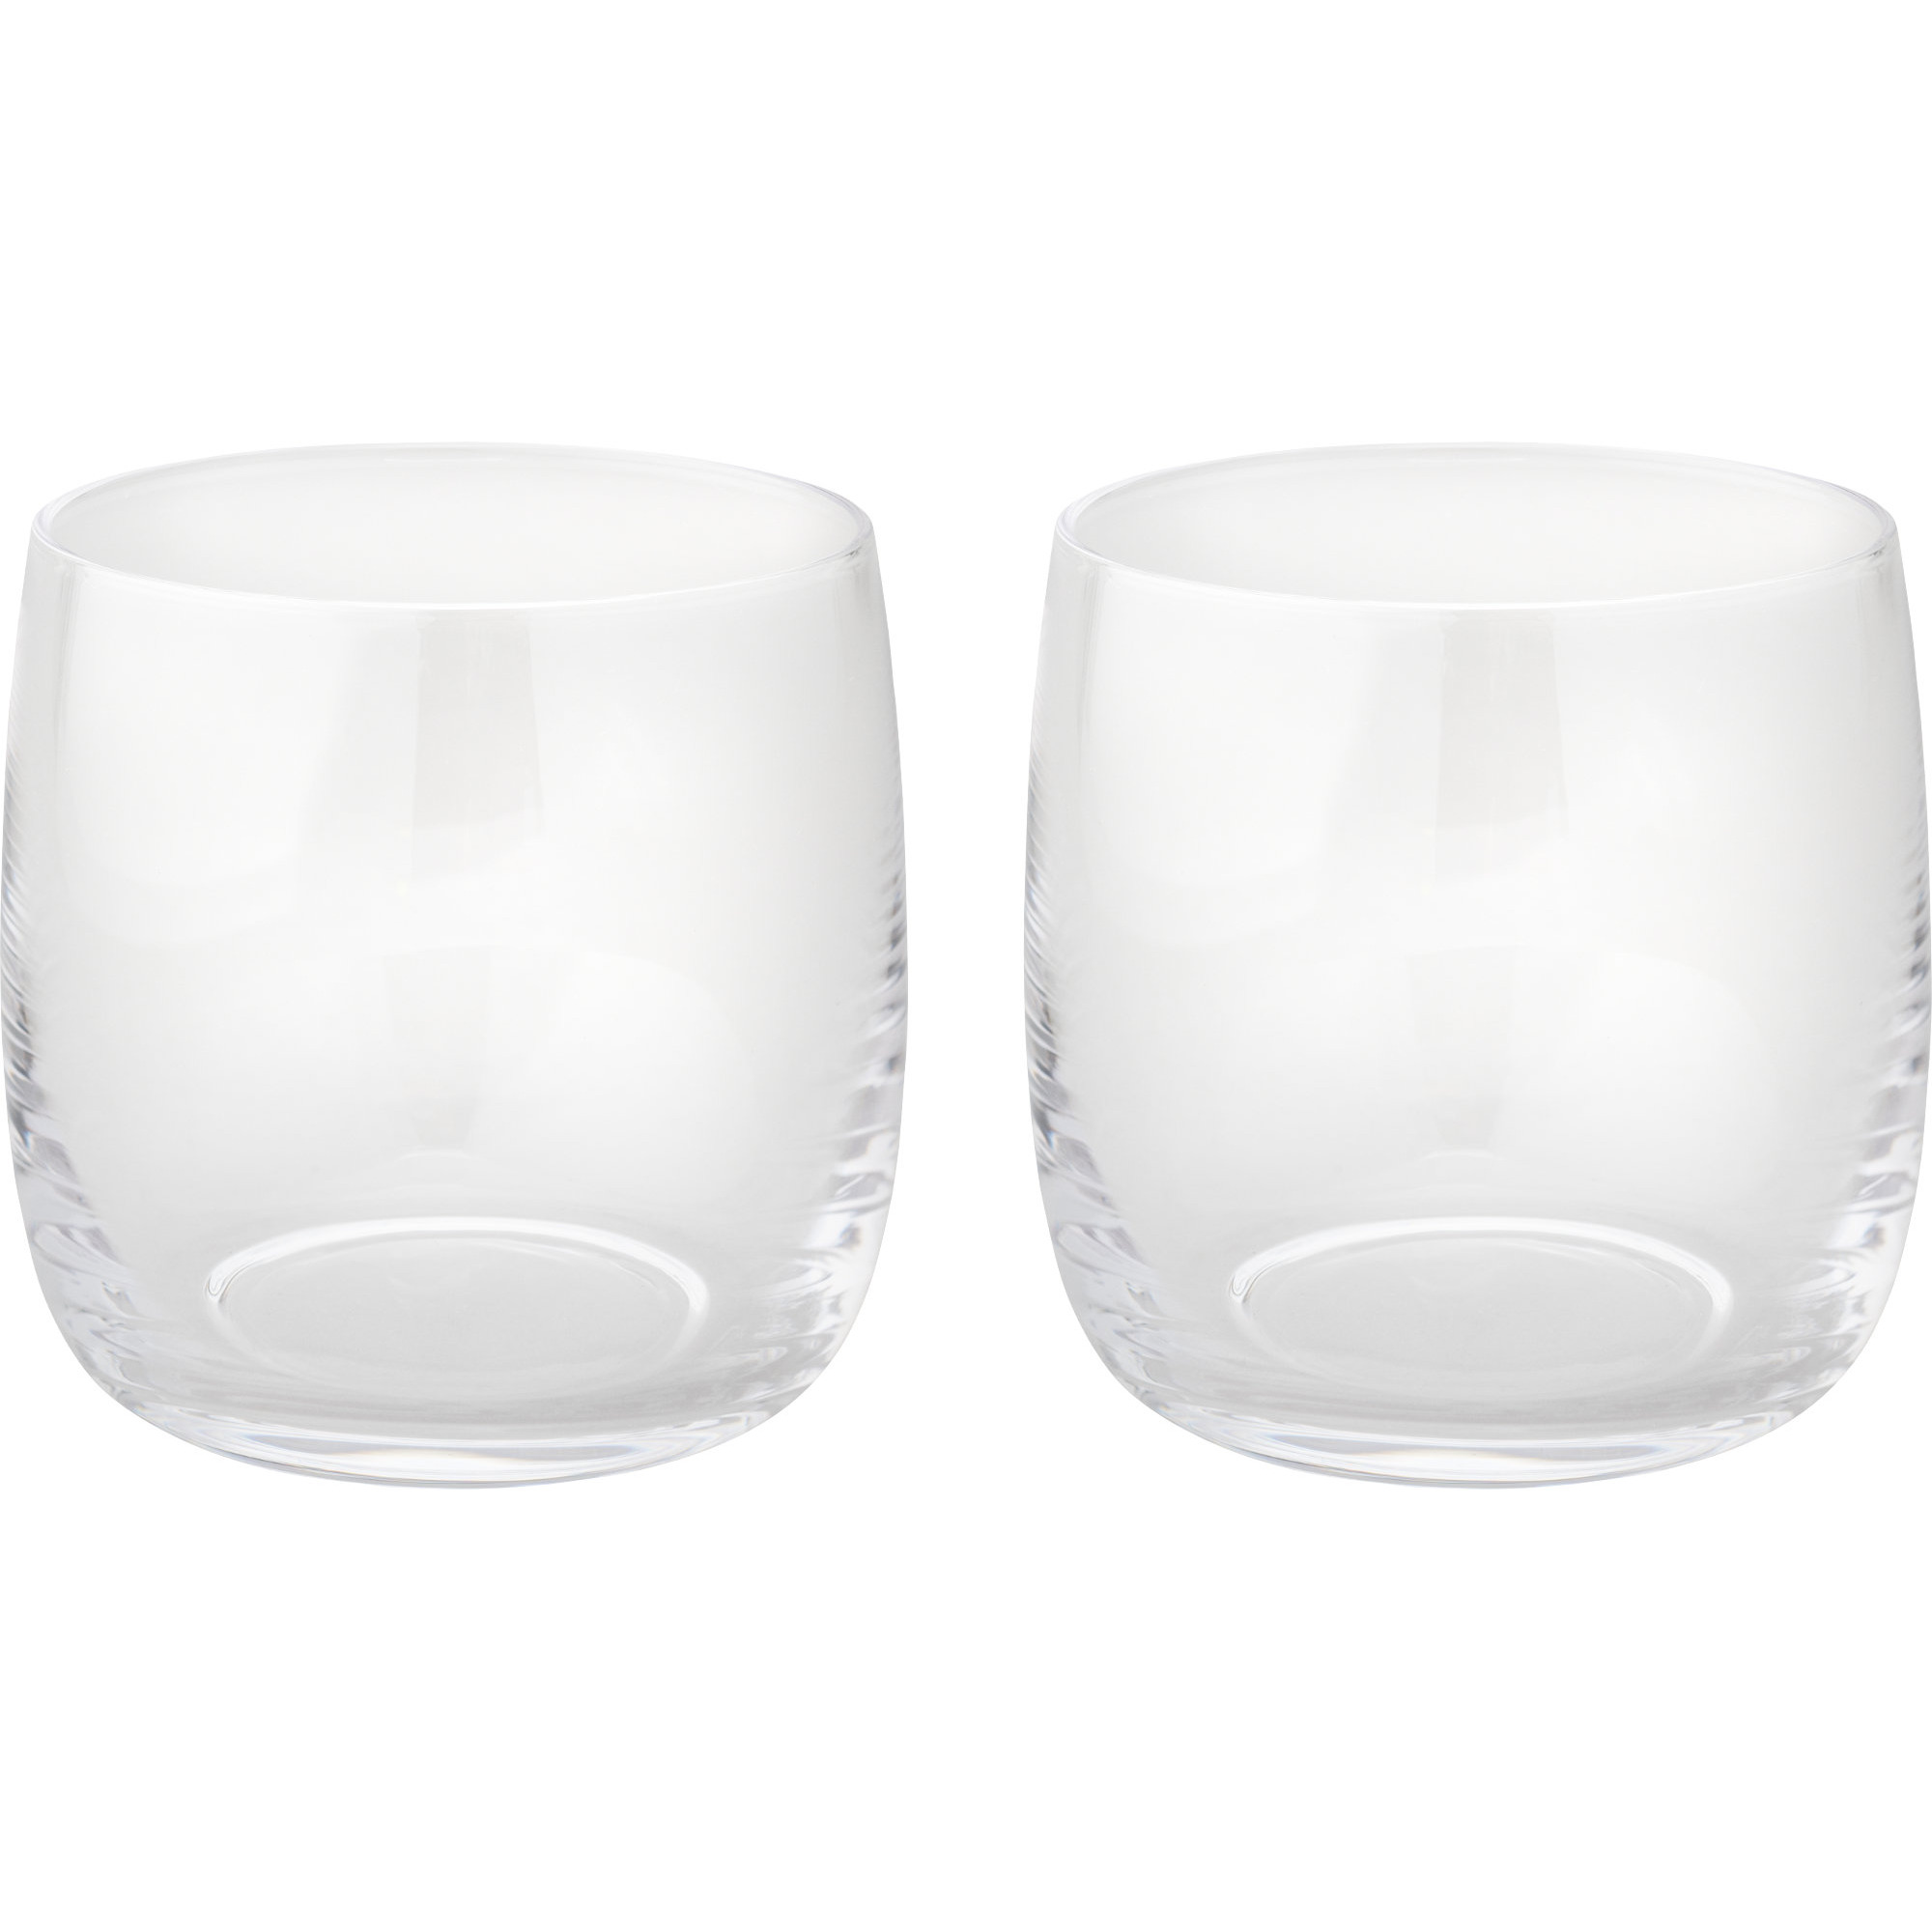 Stelton Foster Glas 02 L 2-pack